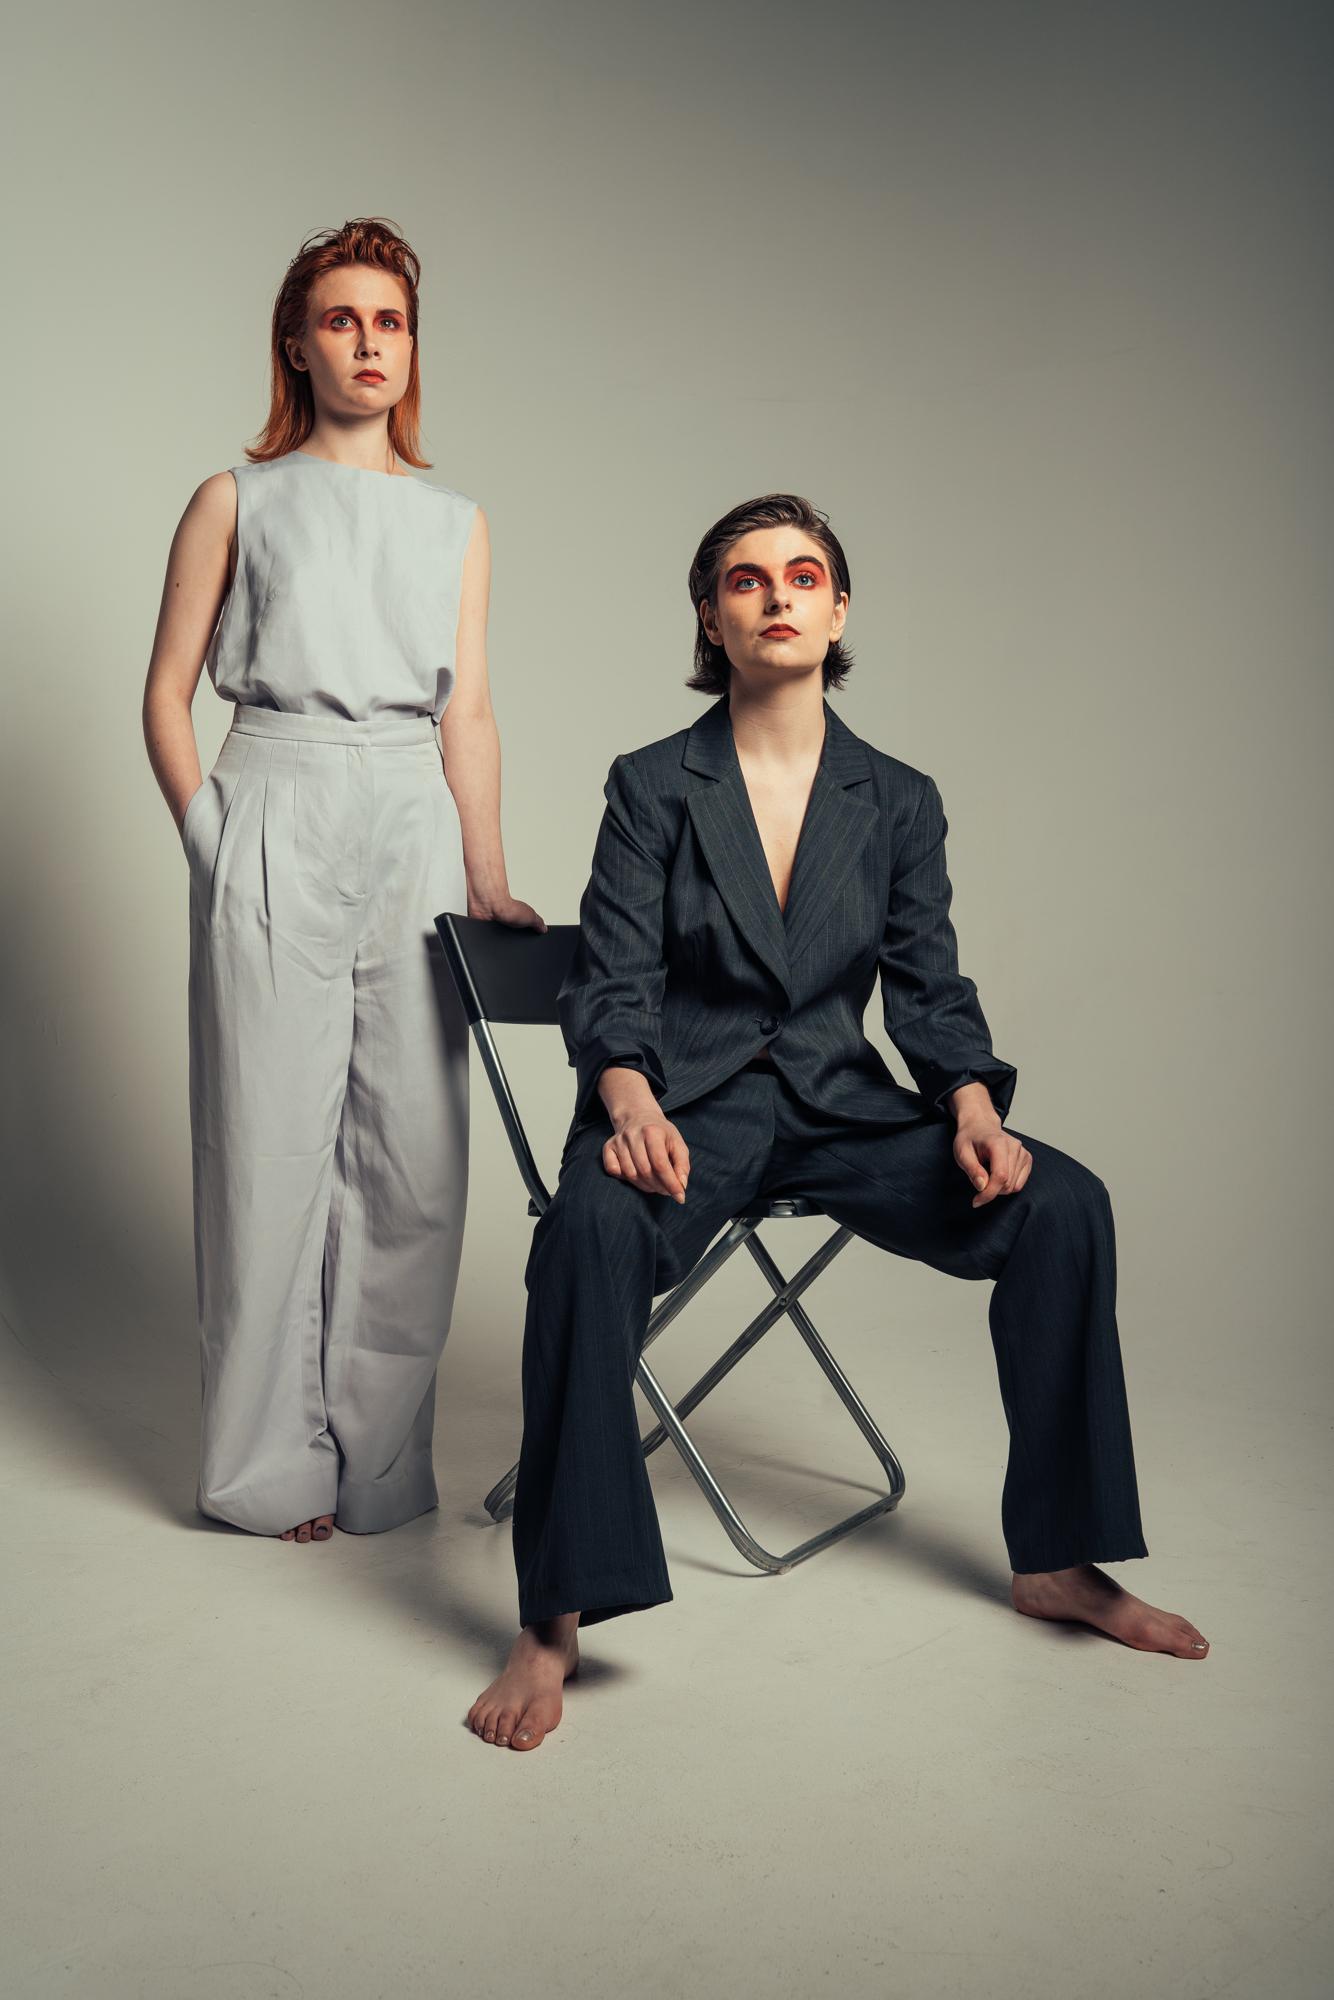 manchester-fashion-photography